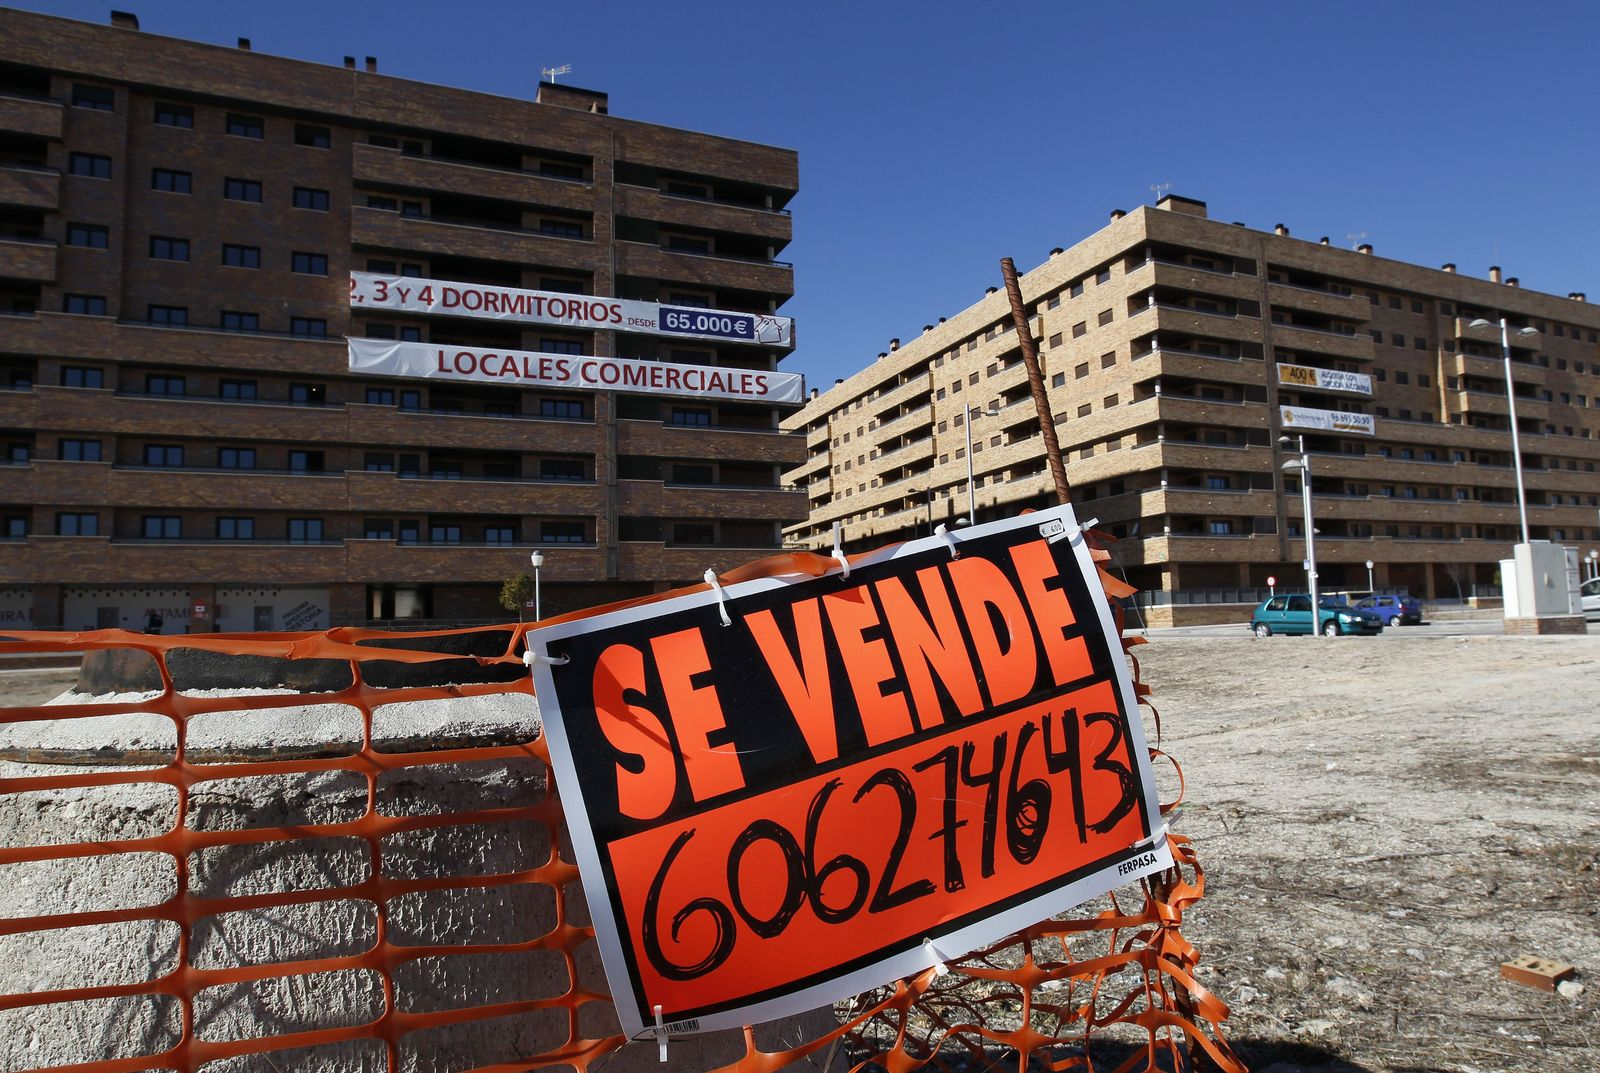 Spanien / Immobilienblase